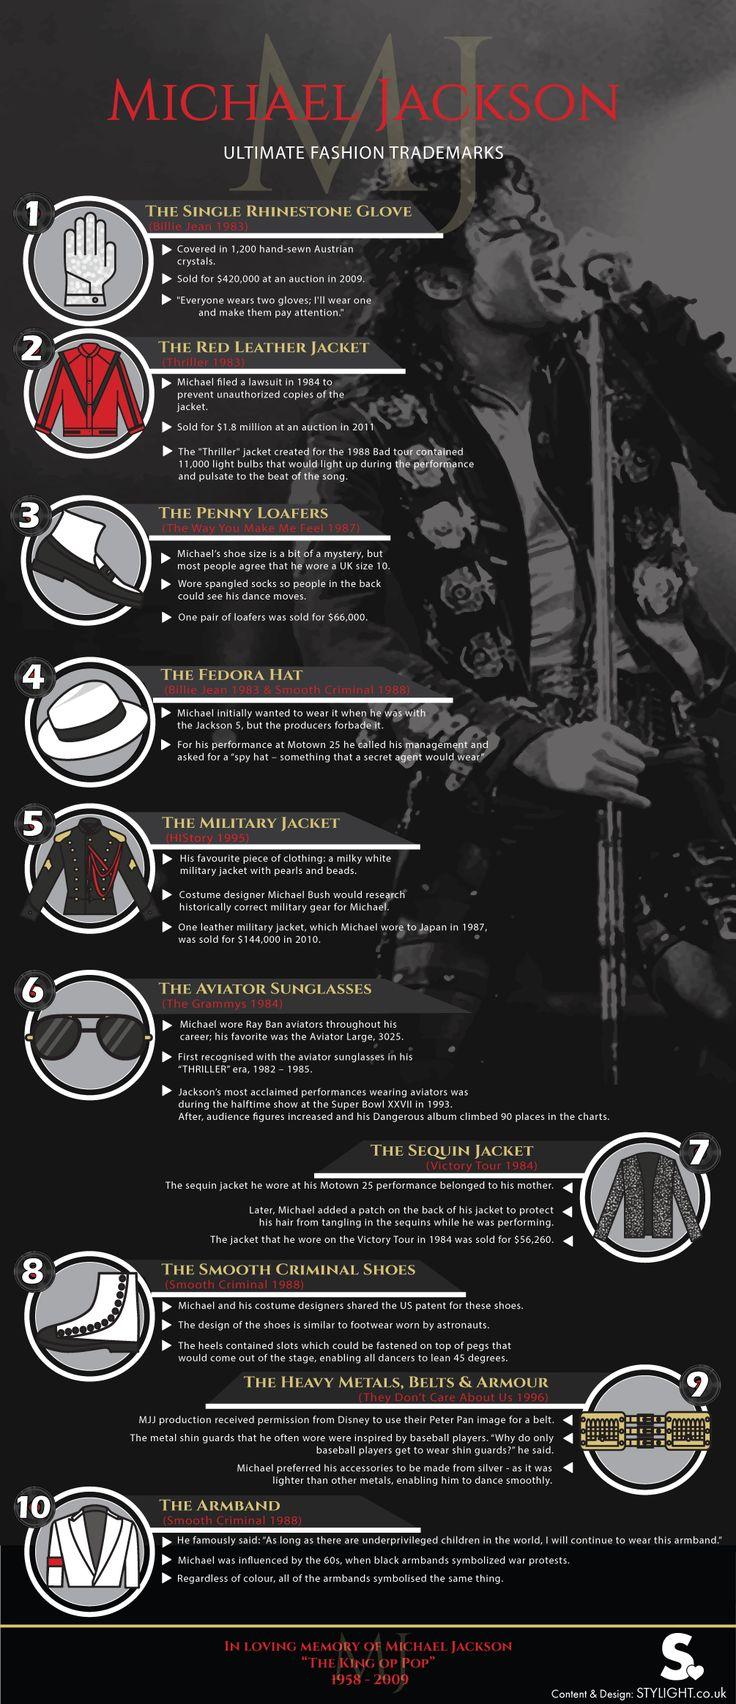 The World Celebrates Michael Jackson's 56th Birthday! http://mjvibe.com/News/2014/08/26/the-world-celebrates-michael-jacksons-56th-birthday/